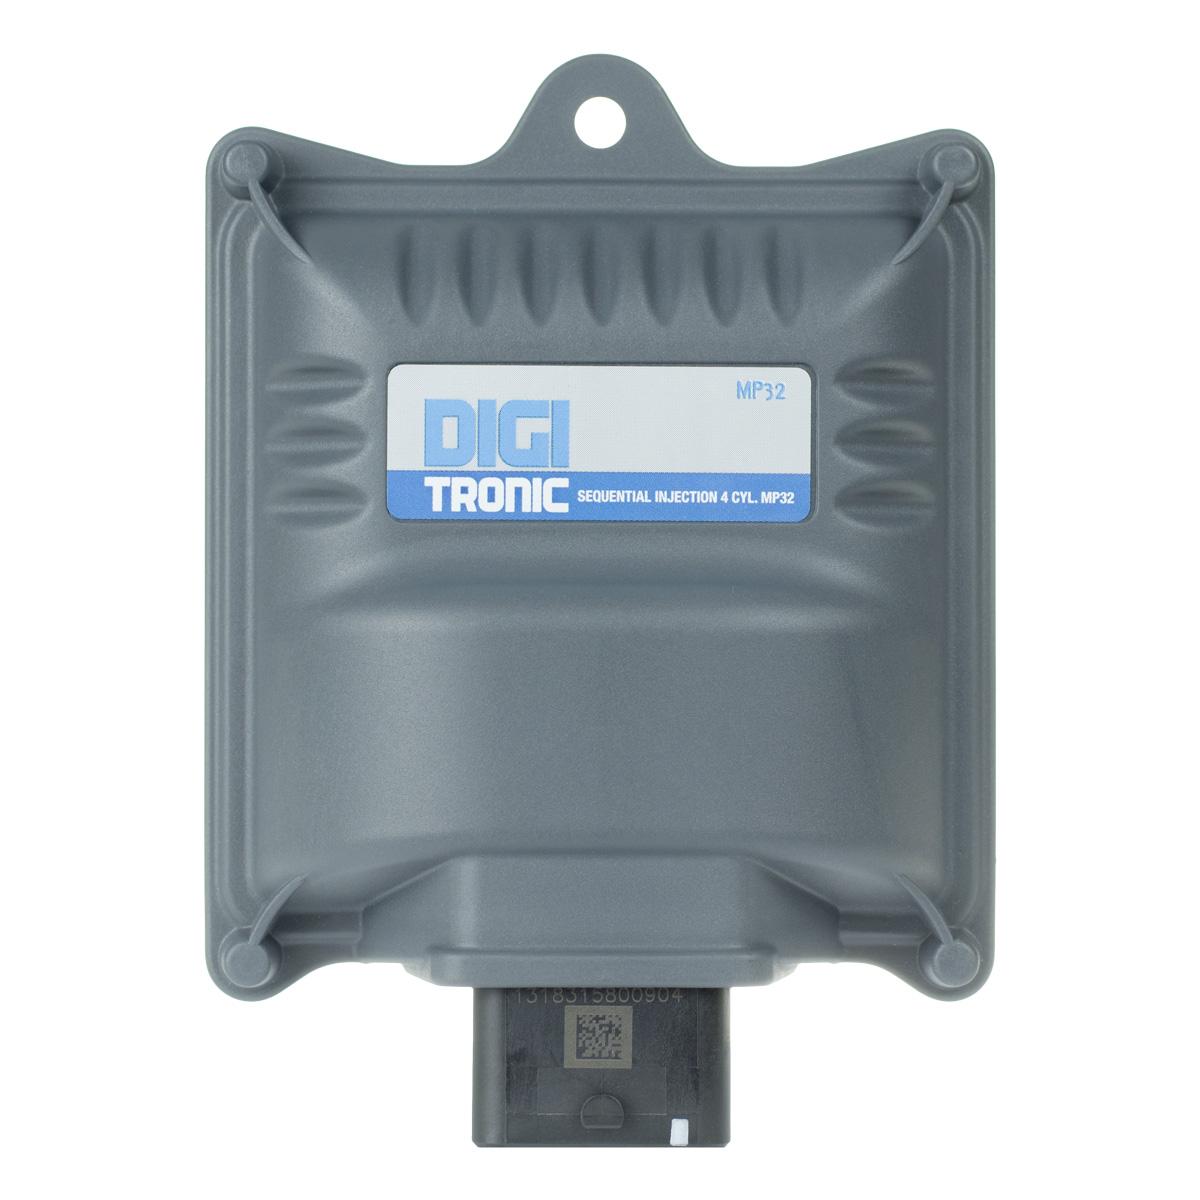 DIGITRONIC MP32